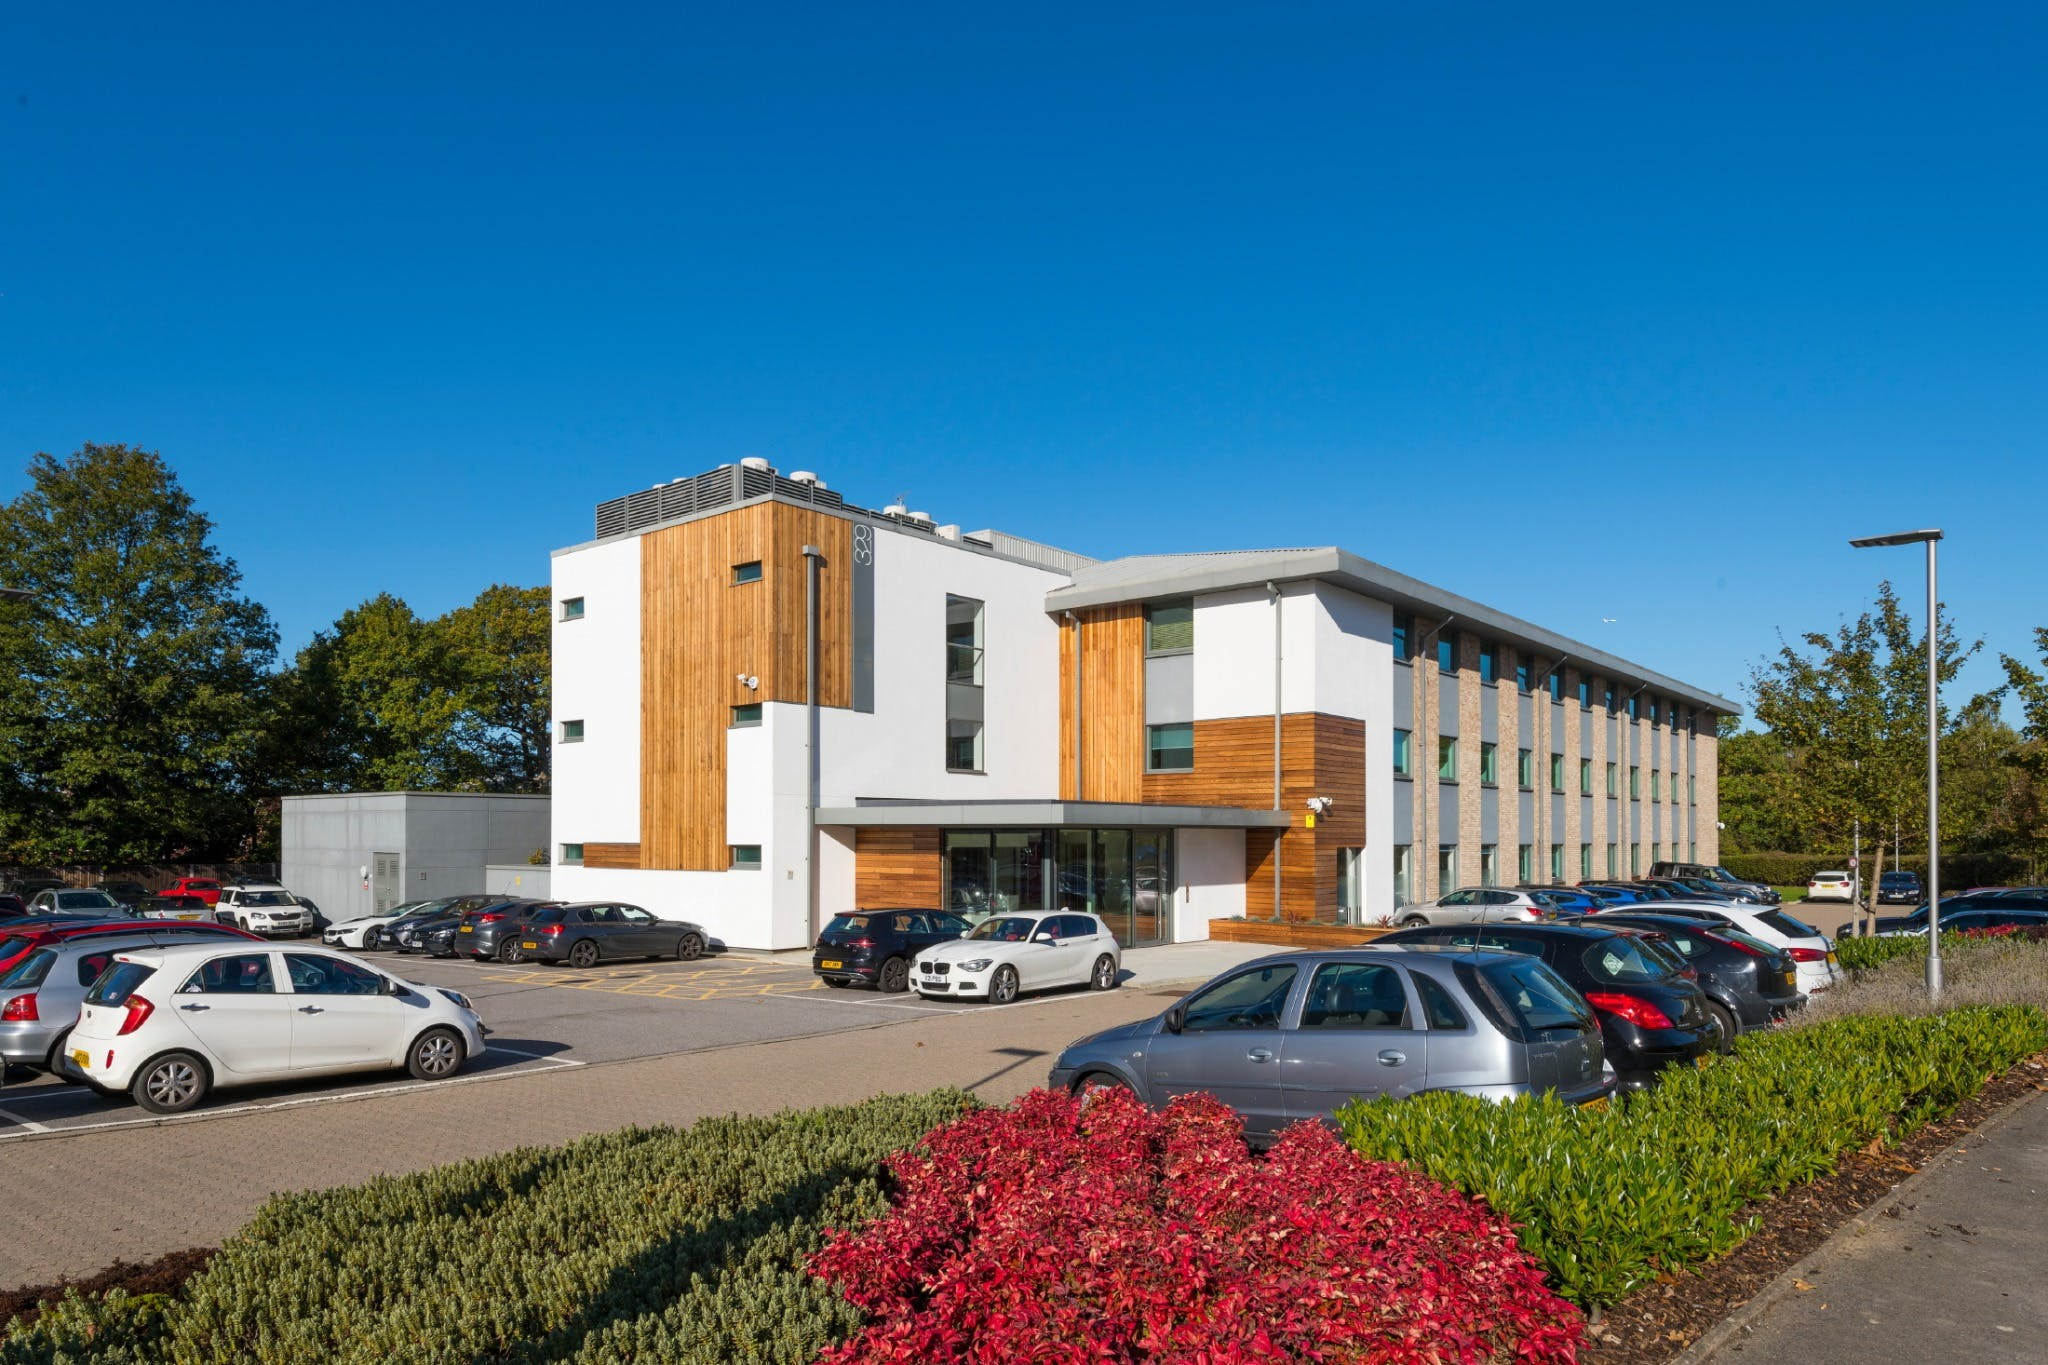 Suites 1.3 & 1.4, 329 Bracknell, Bracknell, Offices To Let - Suites 1.3 & 1.4 329 Bracknell, Doncastle Road, Bracknell, Berkshire RG12